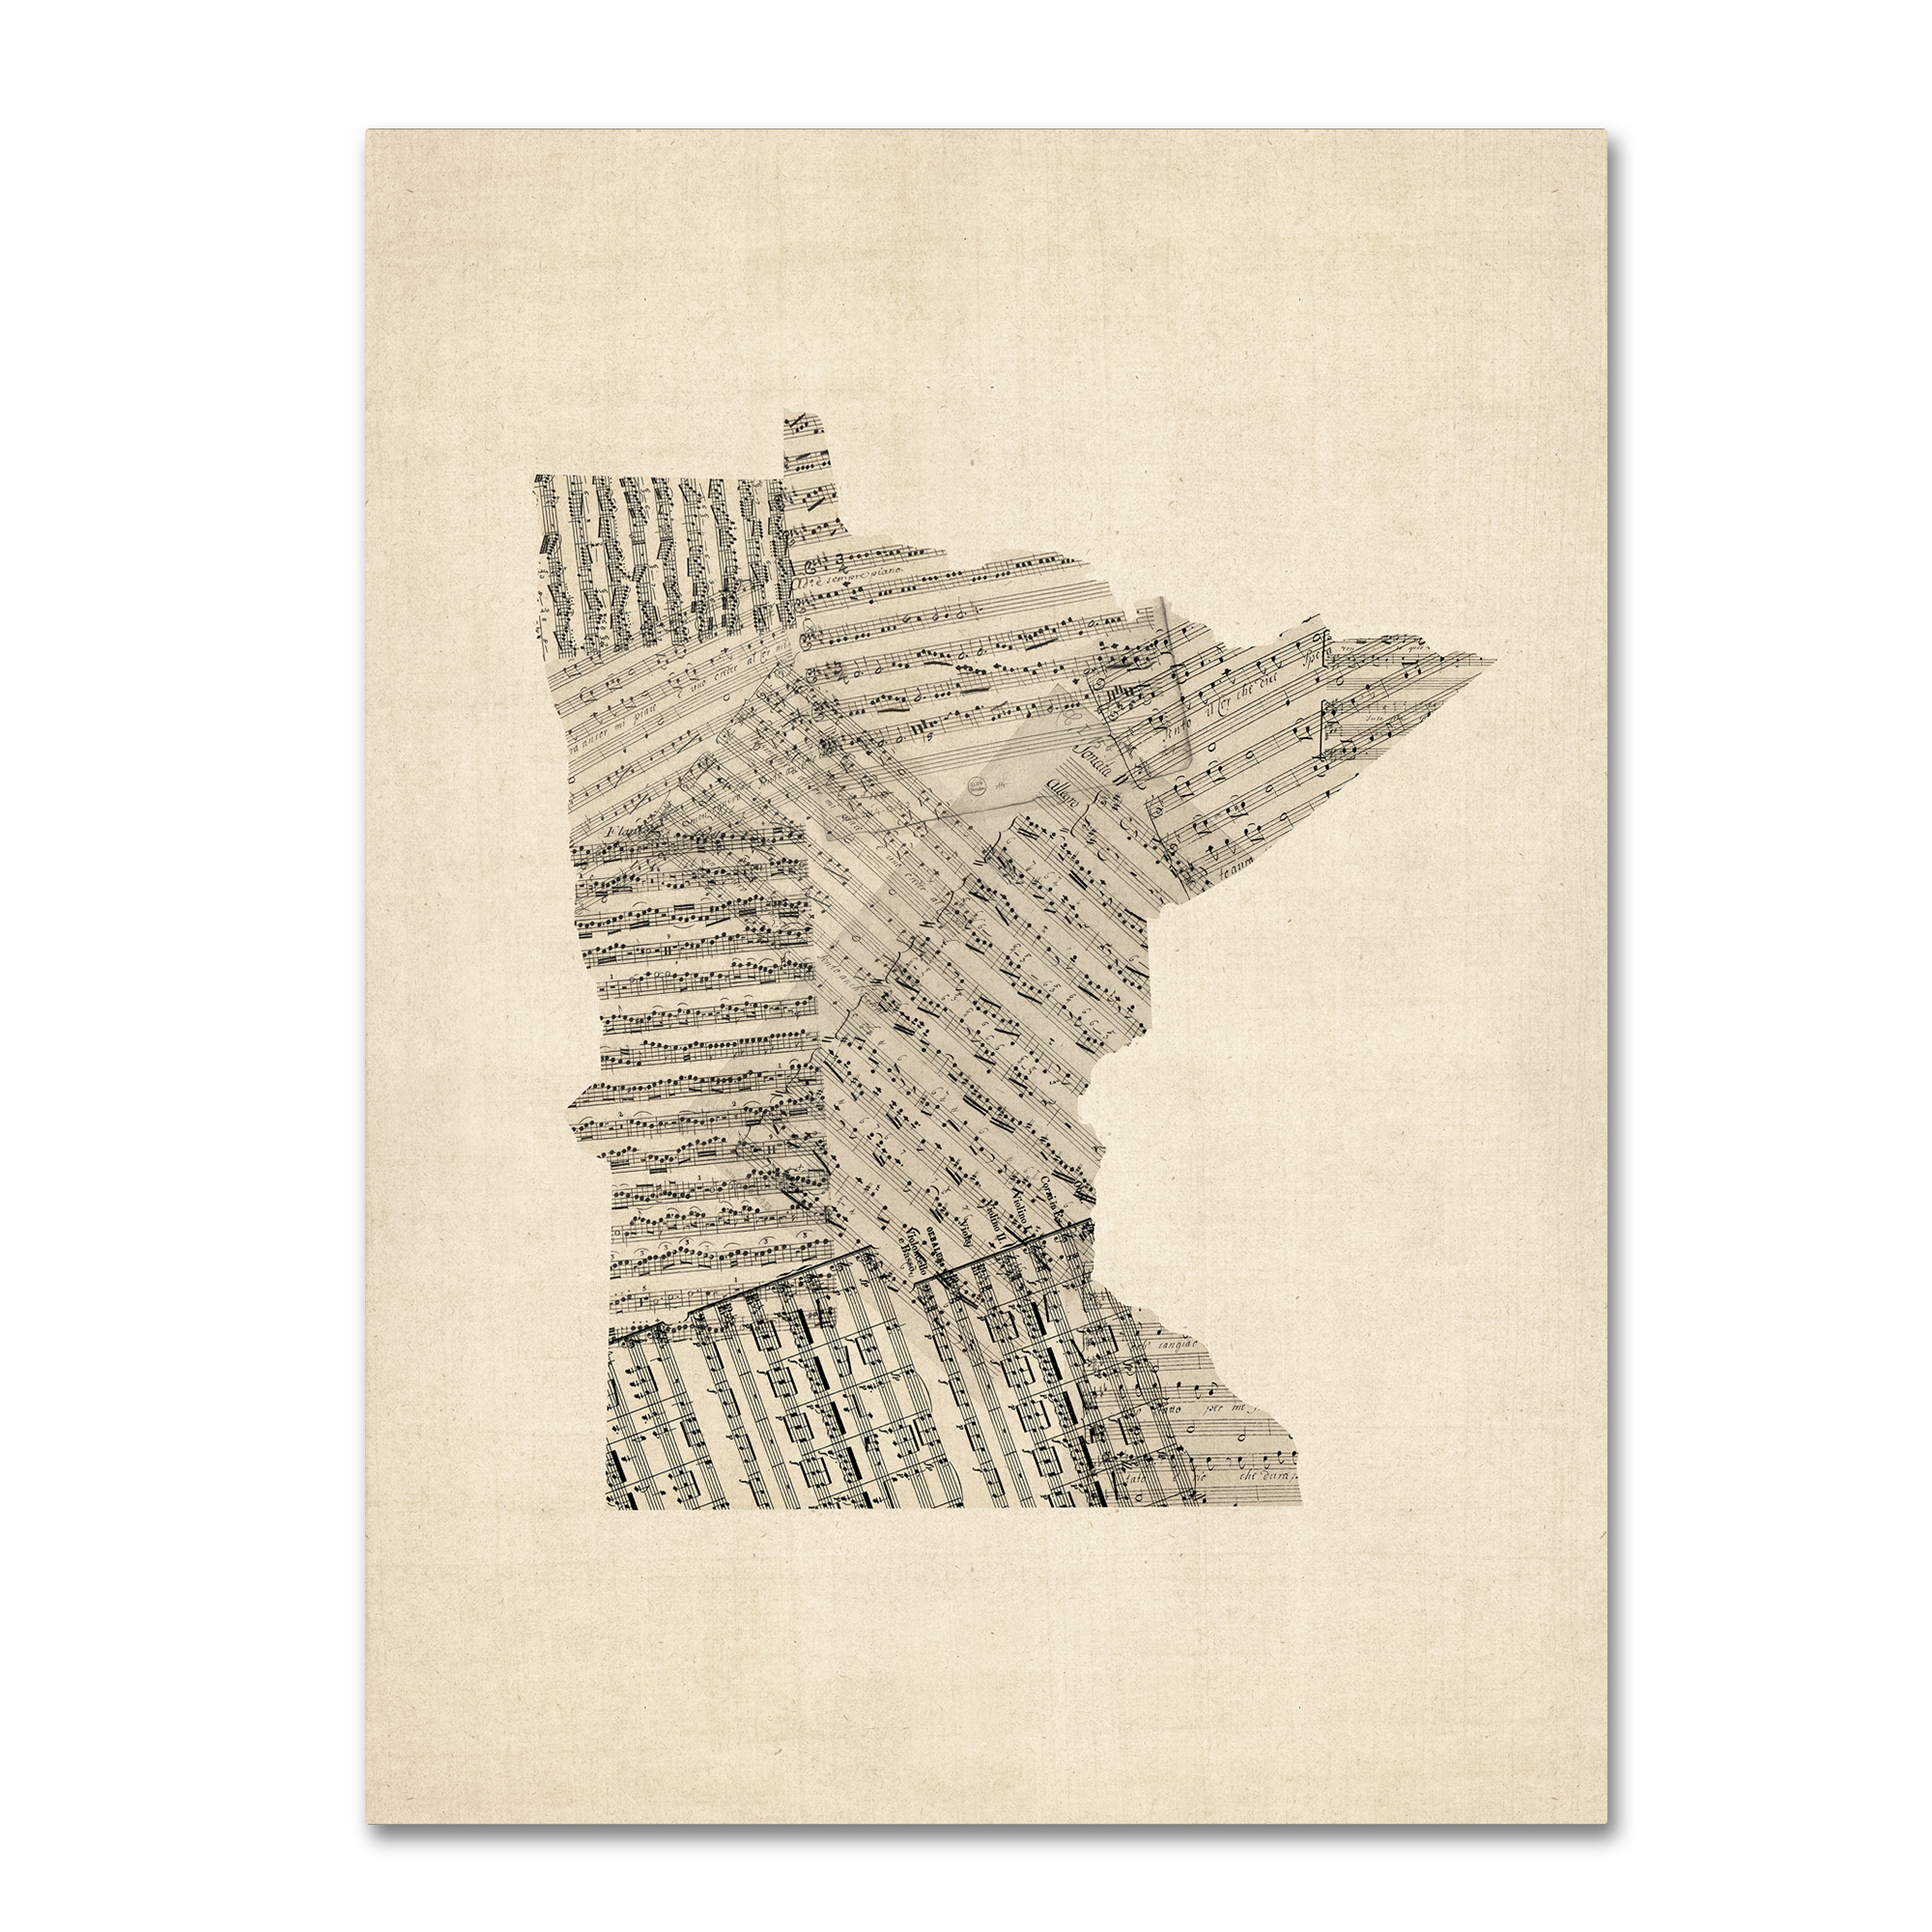 Michael Tompsett 'Old Sheet Music Map of Minnesota' Canvas Art 18 x 24